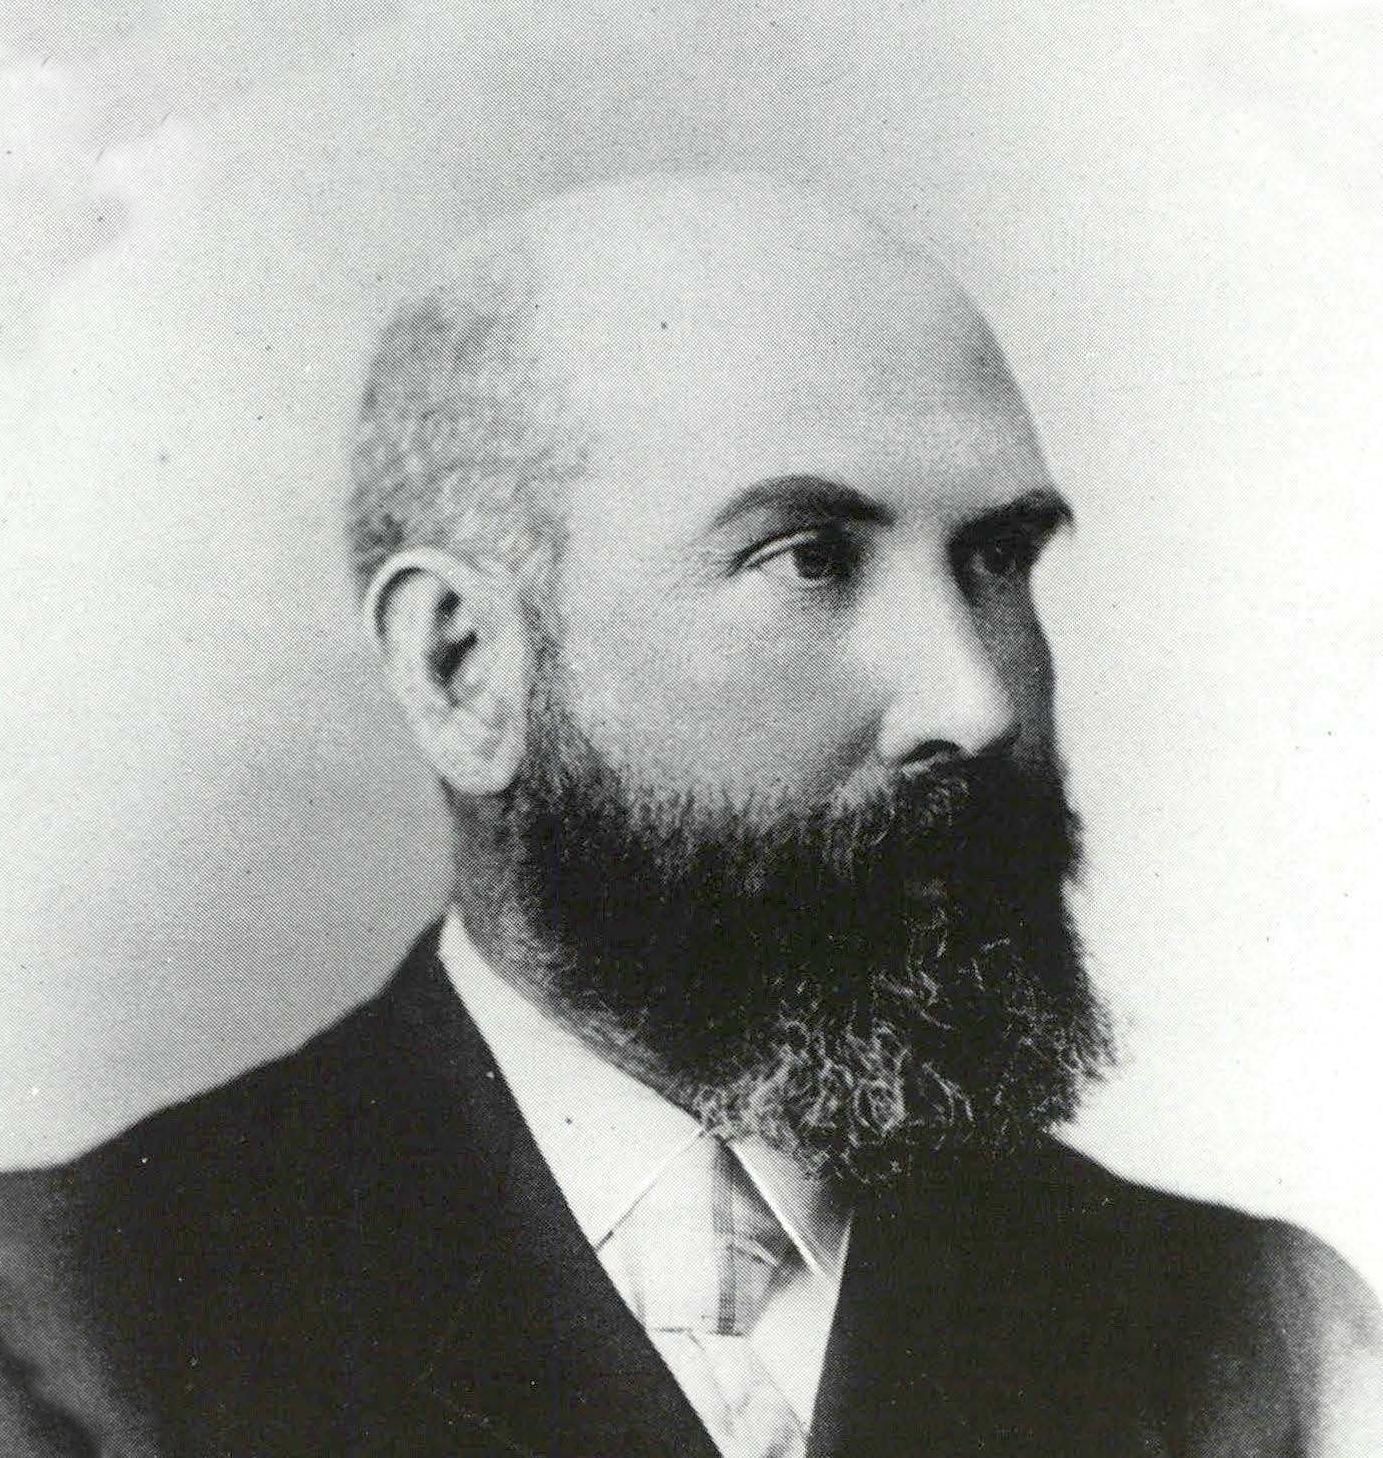 Mr Thomas Bourke